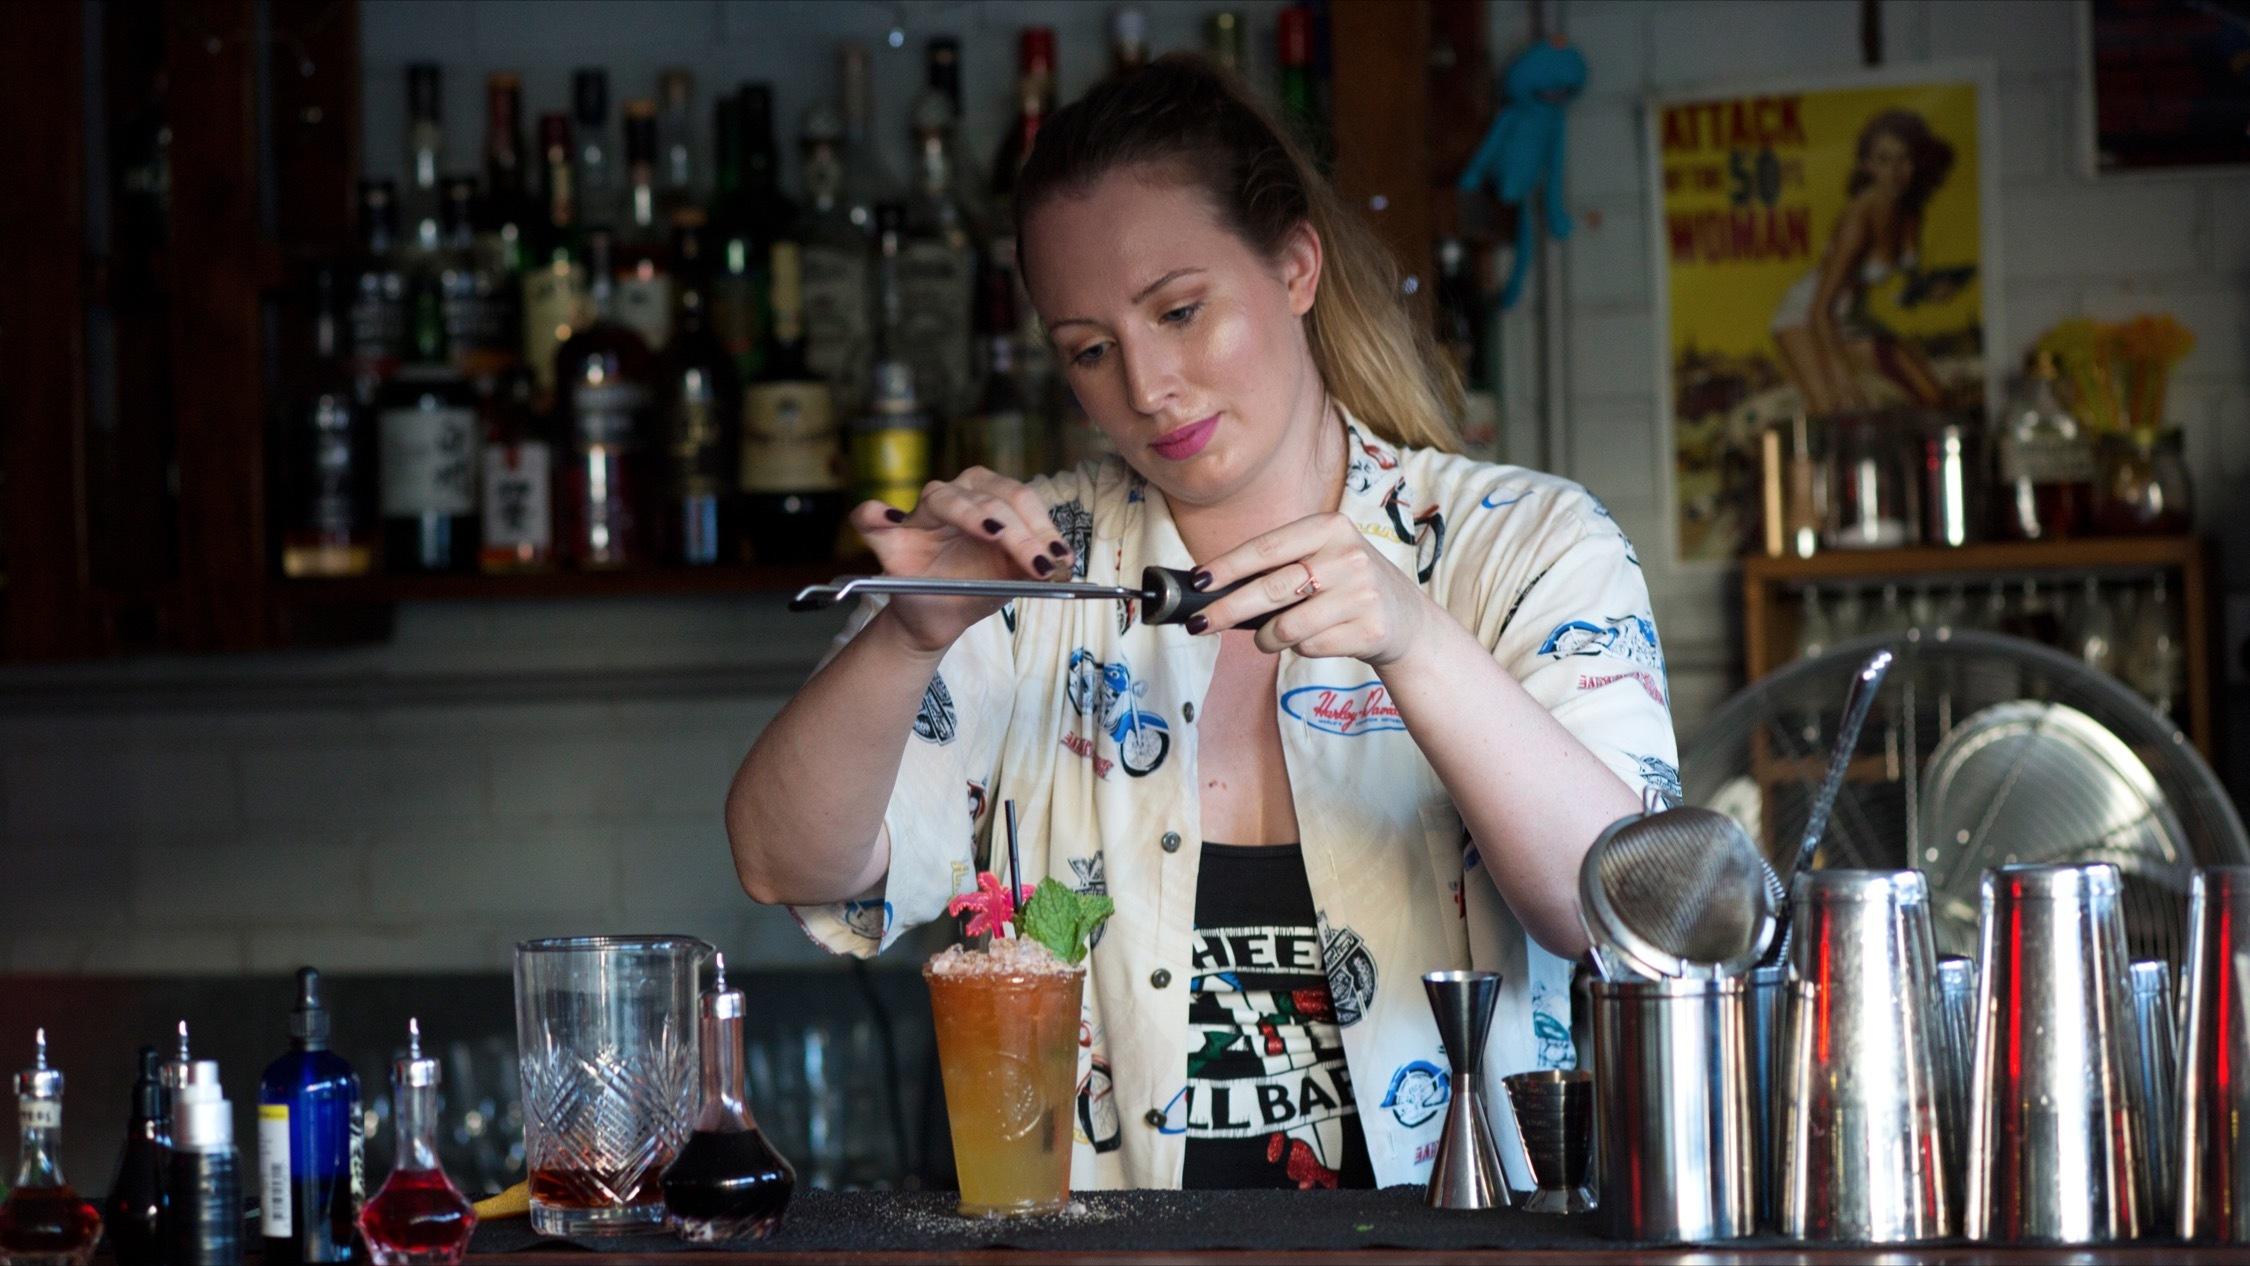 Making cocktails at Uncle Kurts